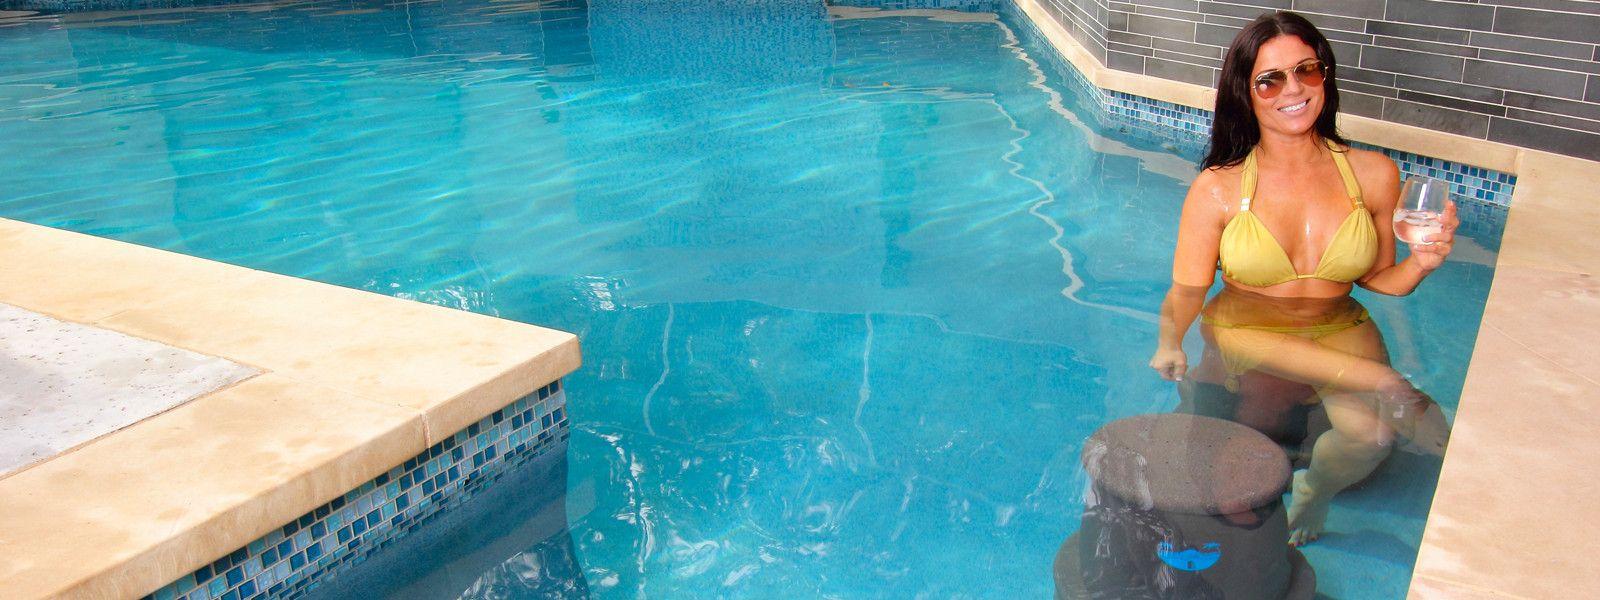 Removable Pool Bar Stools, Pool Seats, Swim up Bar seating ...